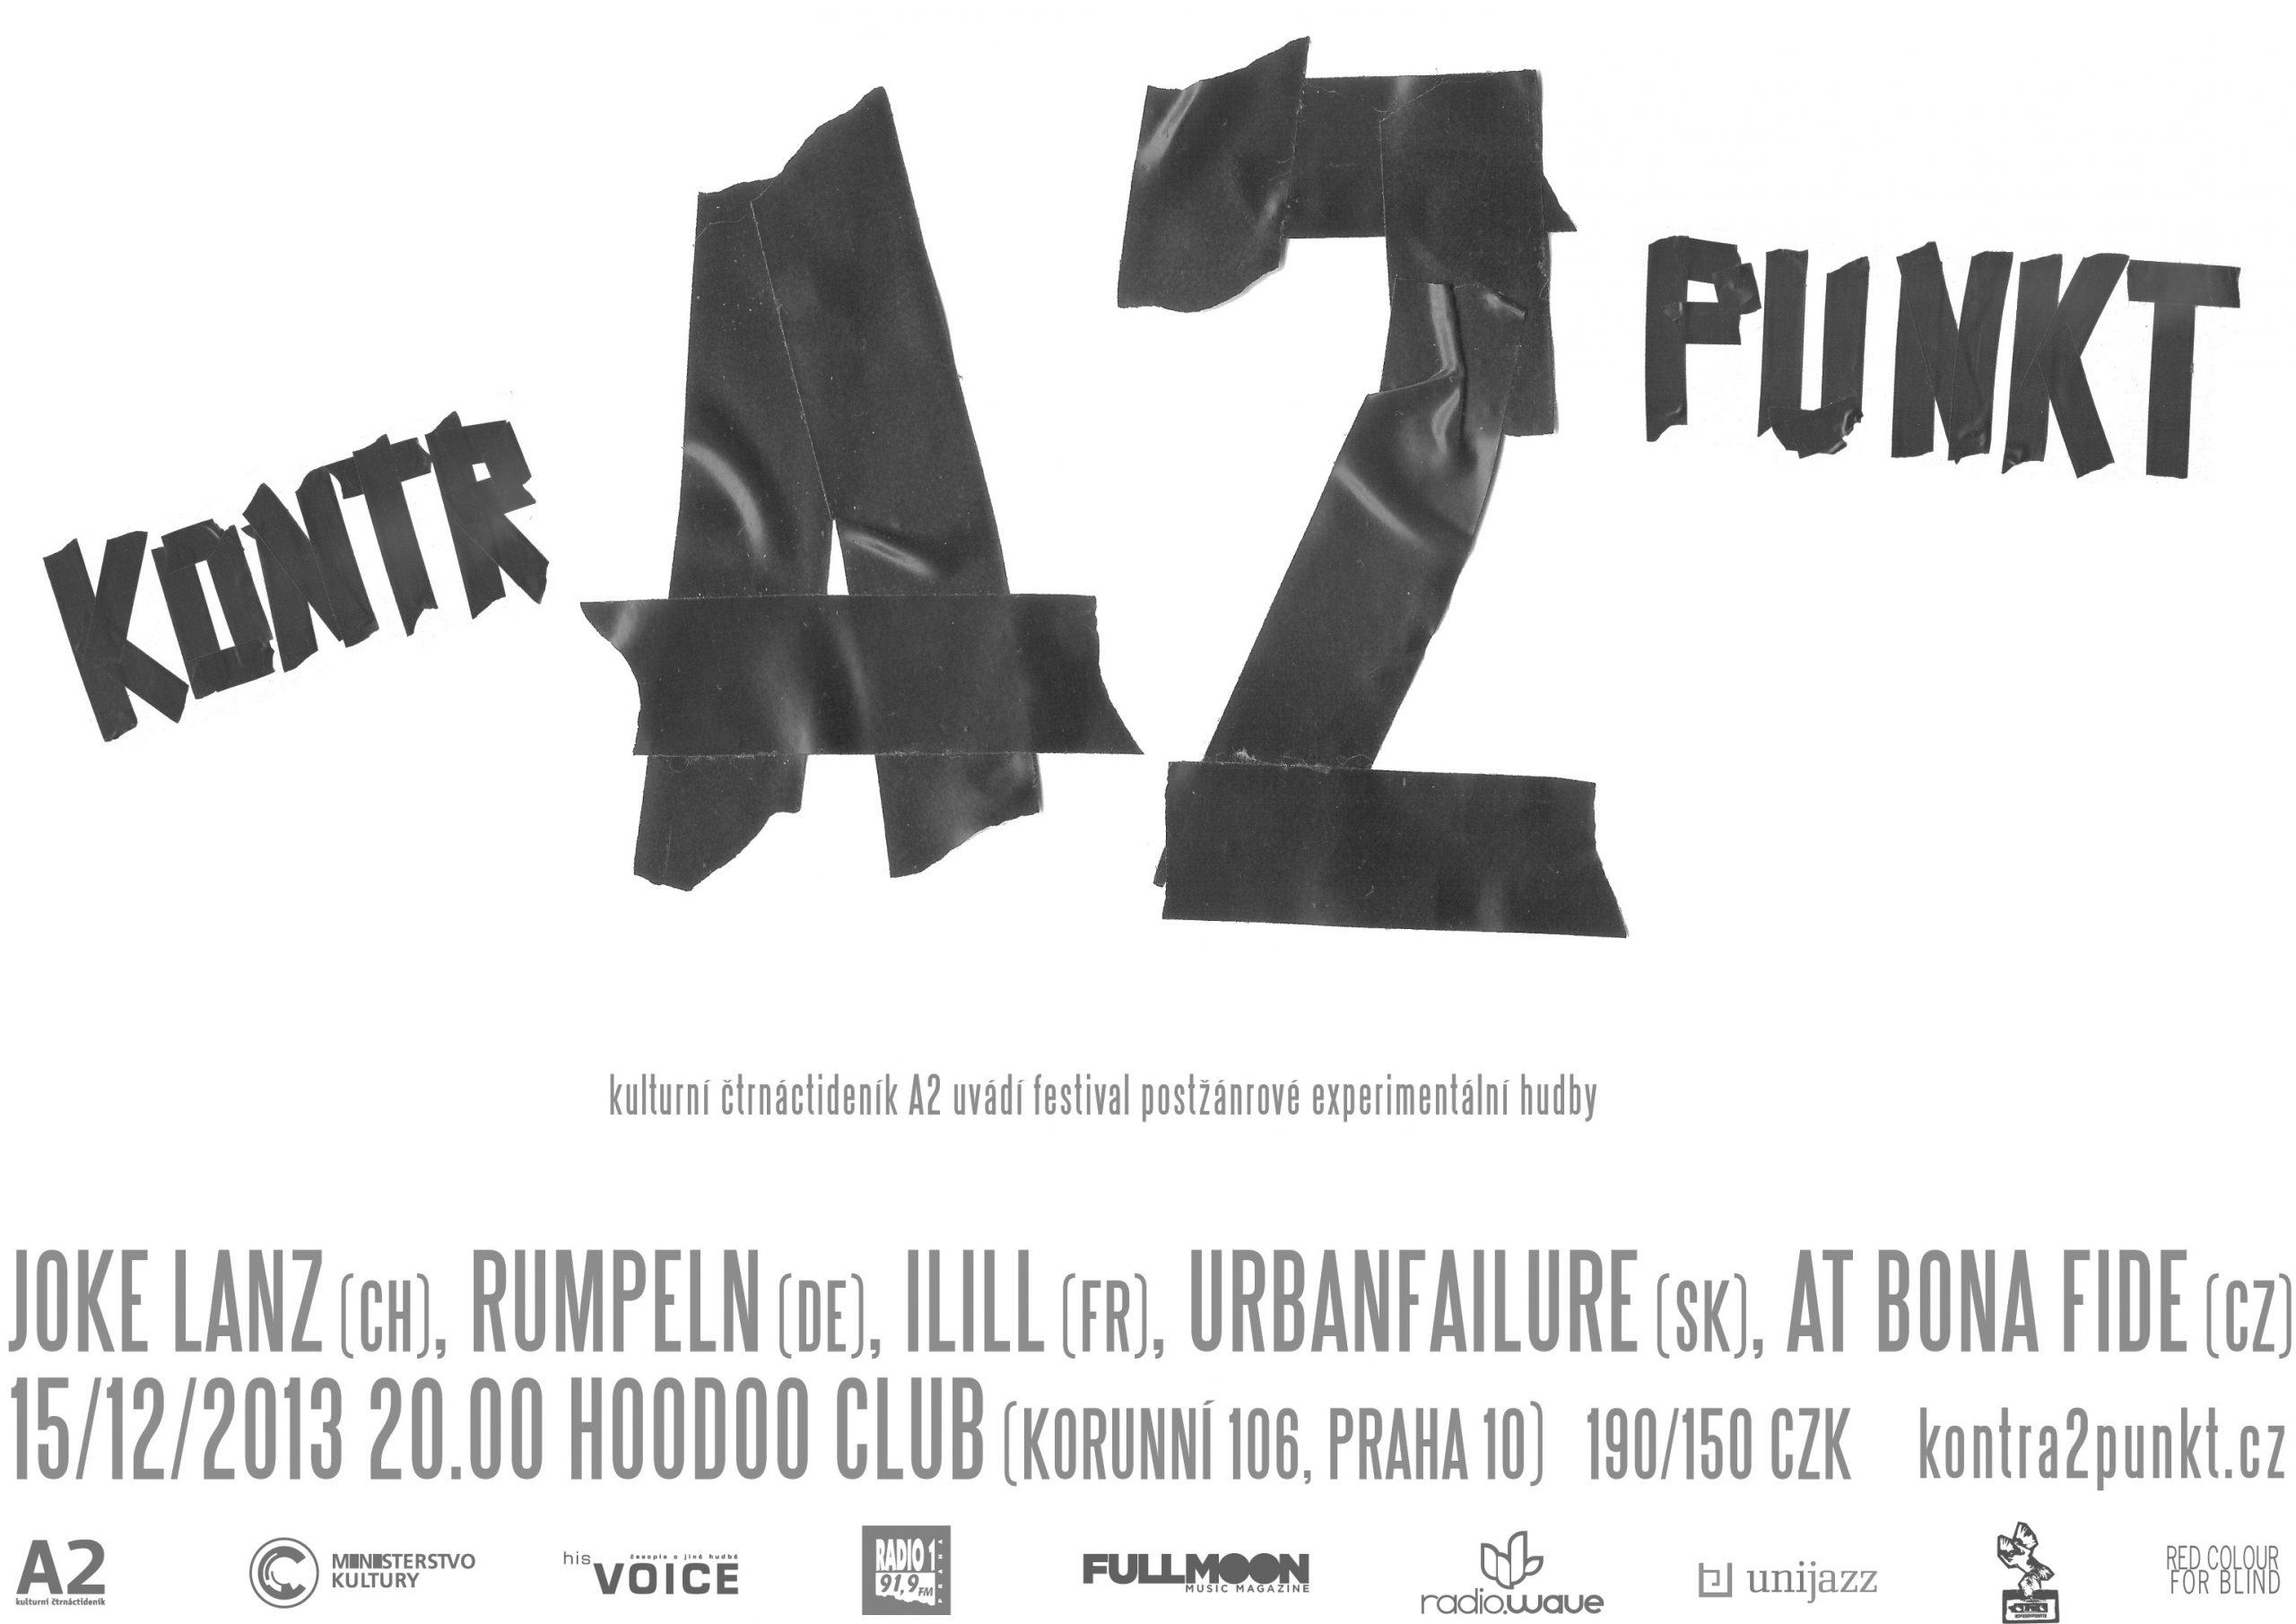 15 December :: KontrA2punkt Festival Praha